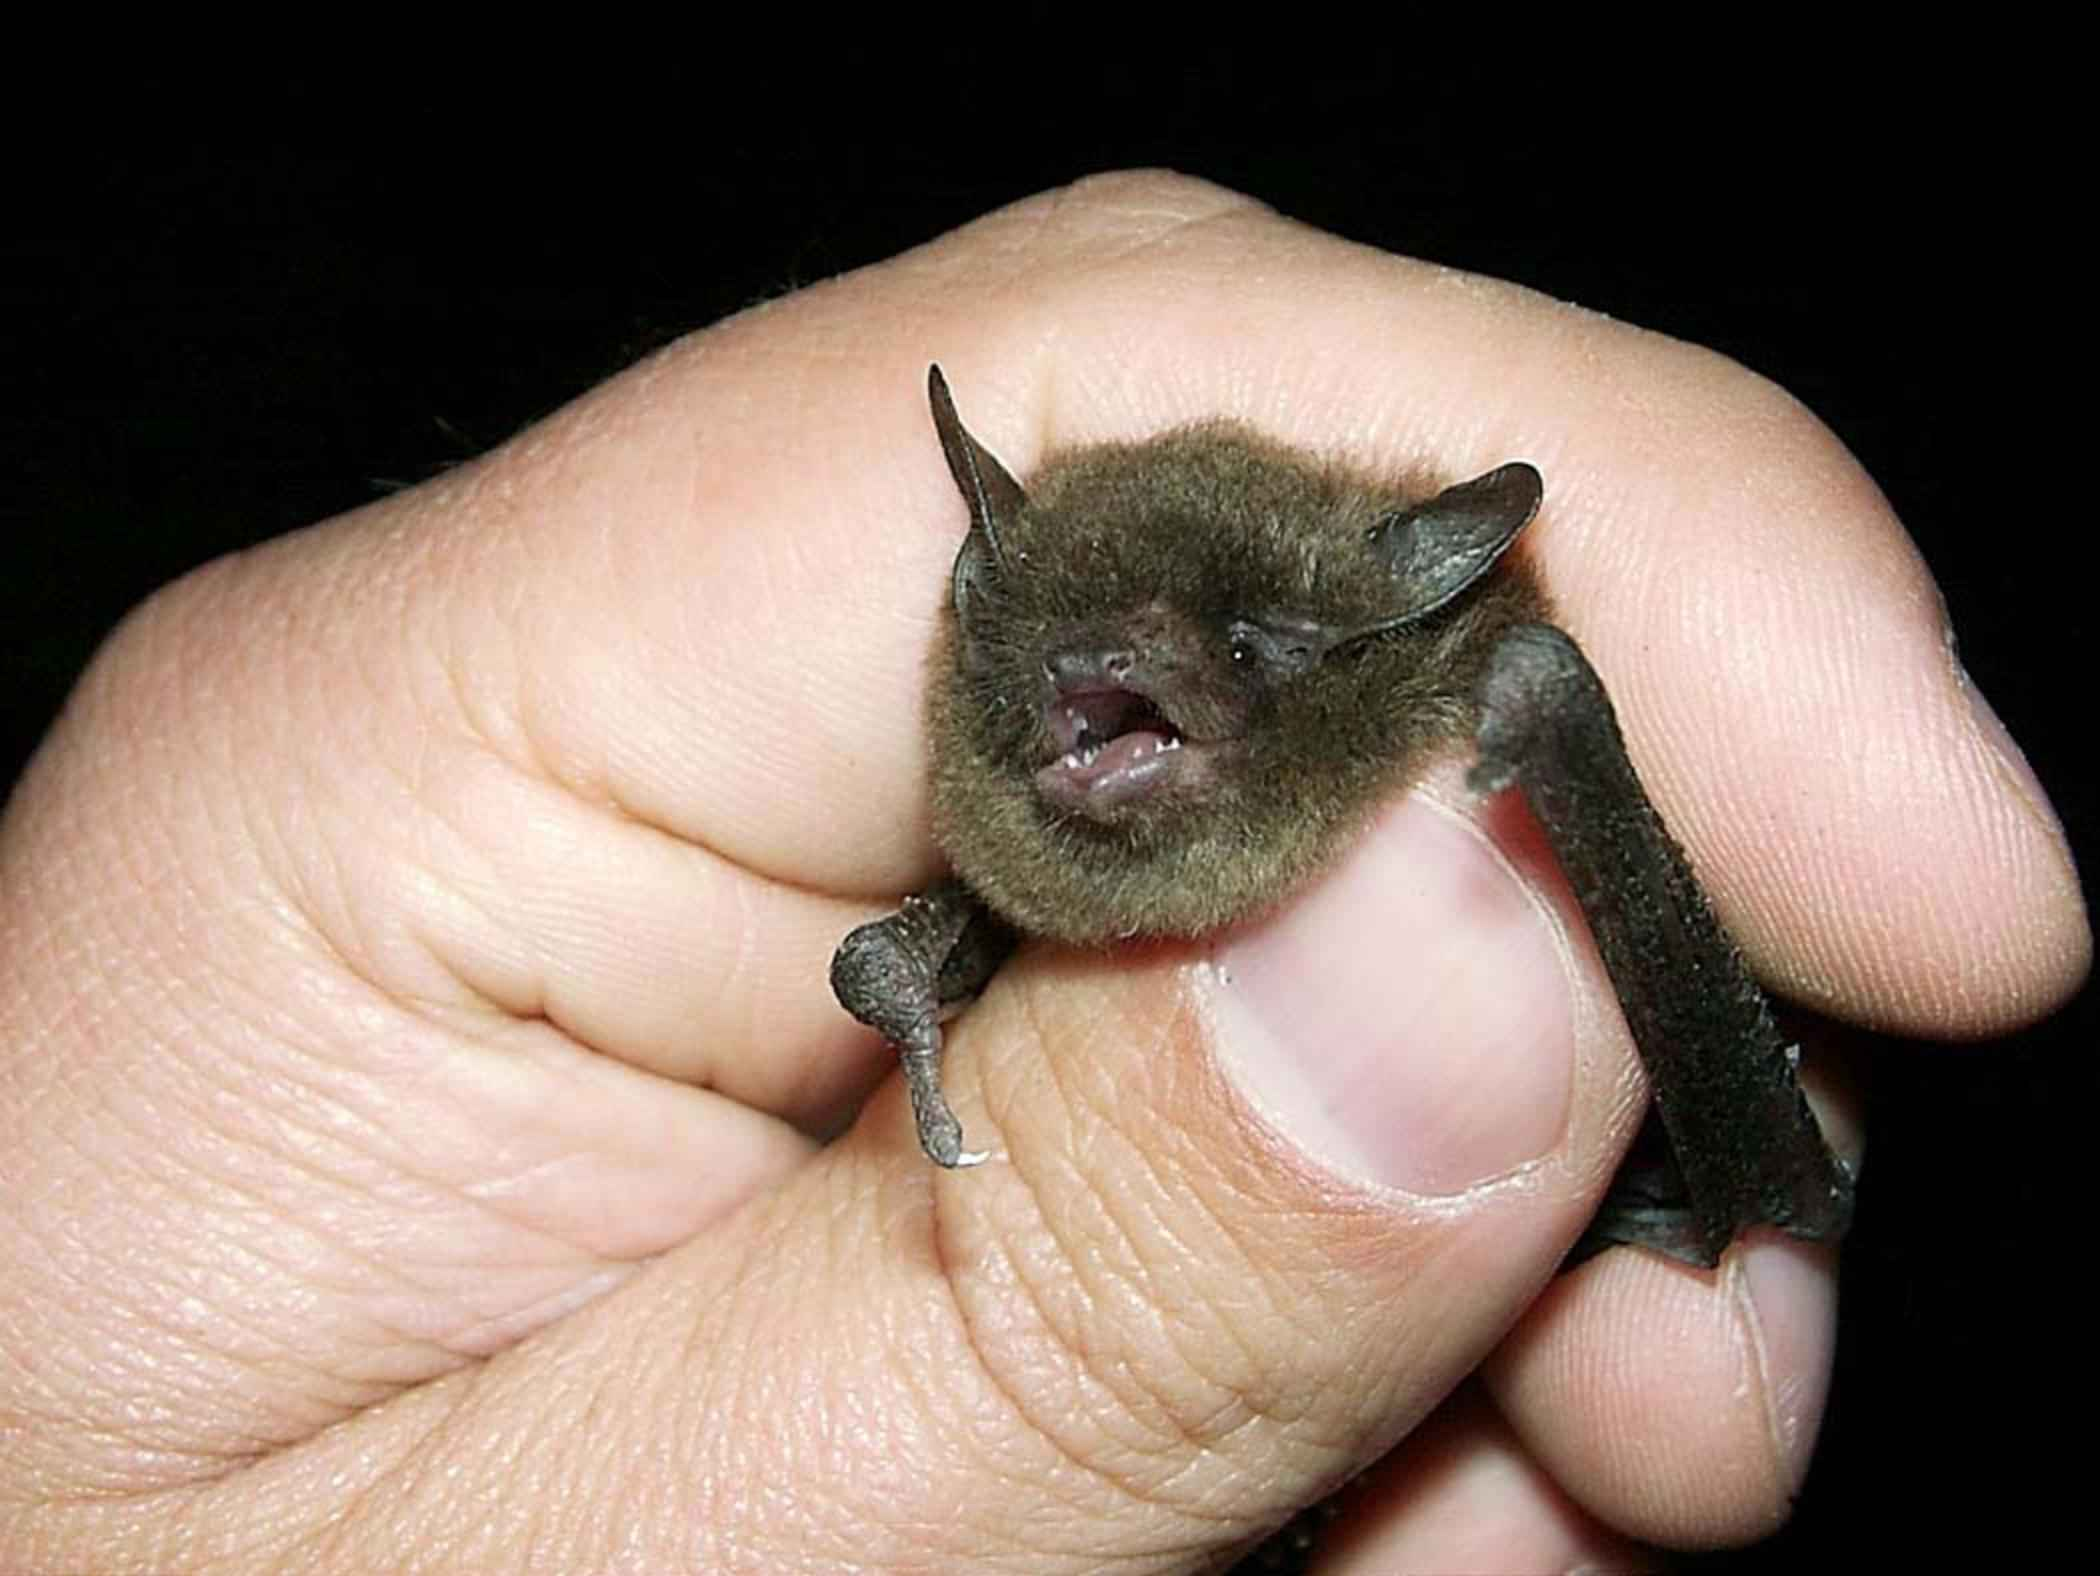 Picture of a captured gray myotis bat